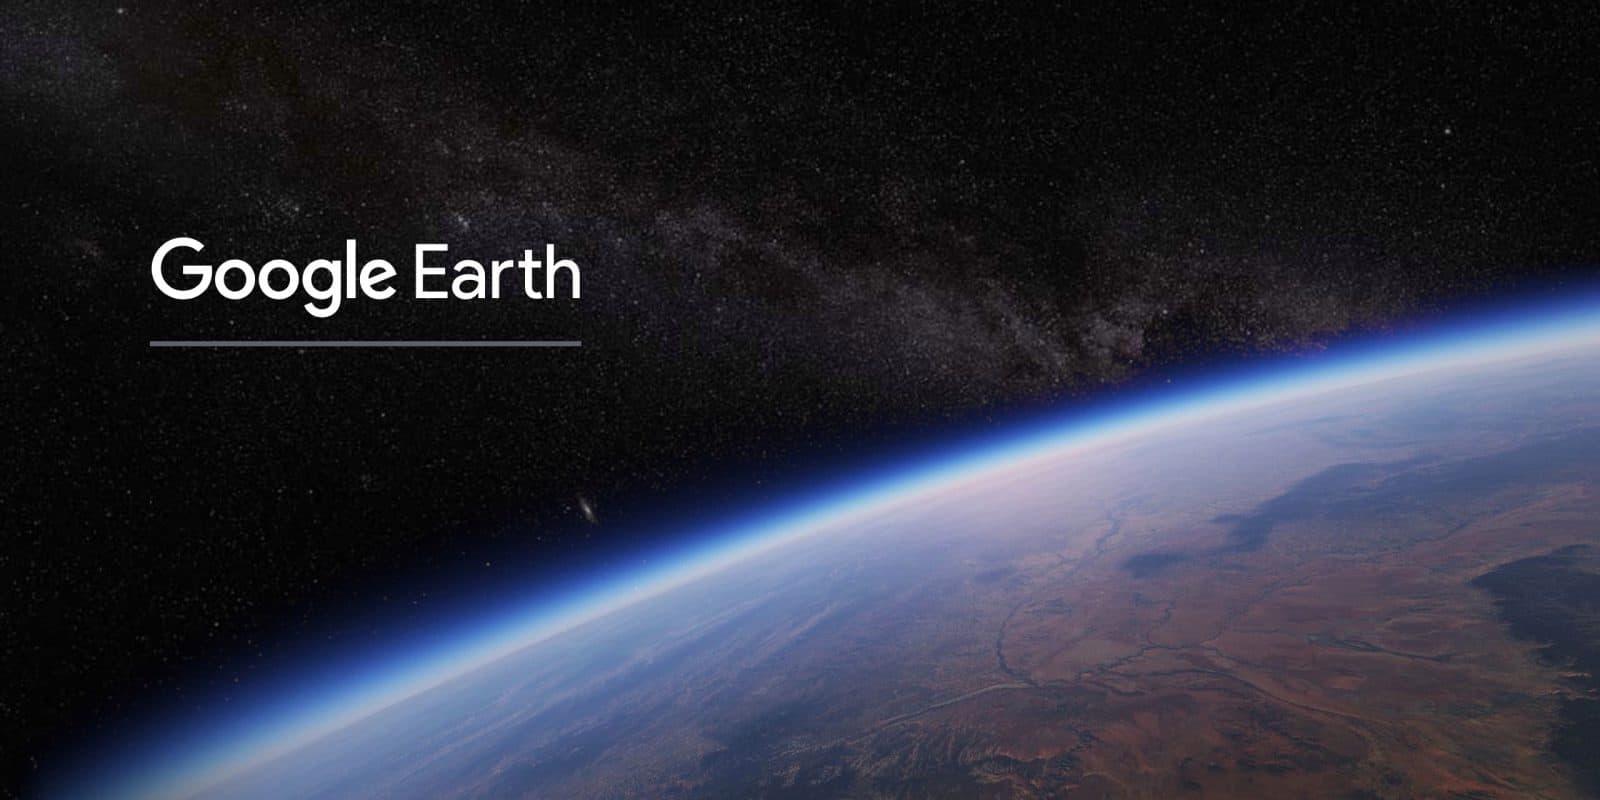 google earth cover main